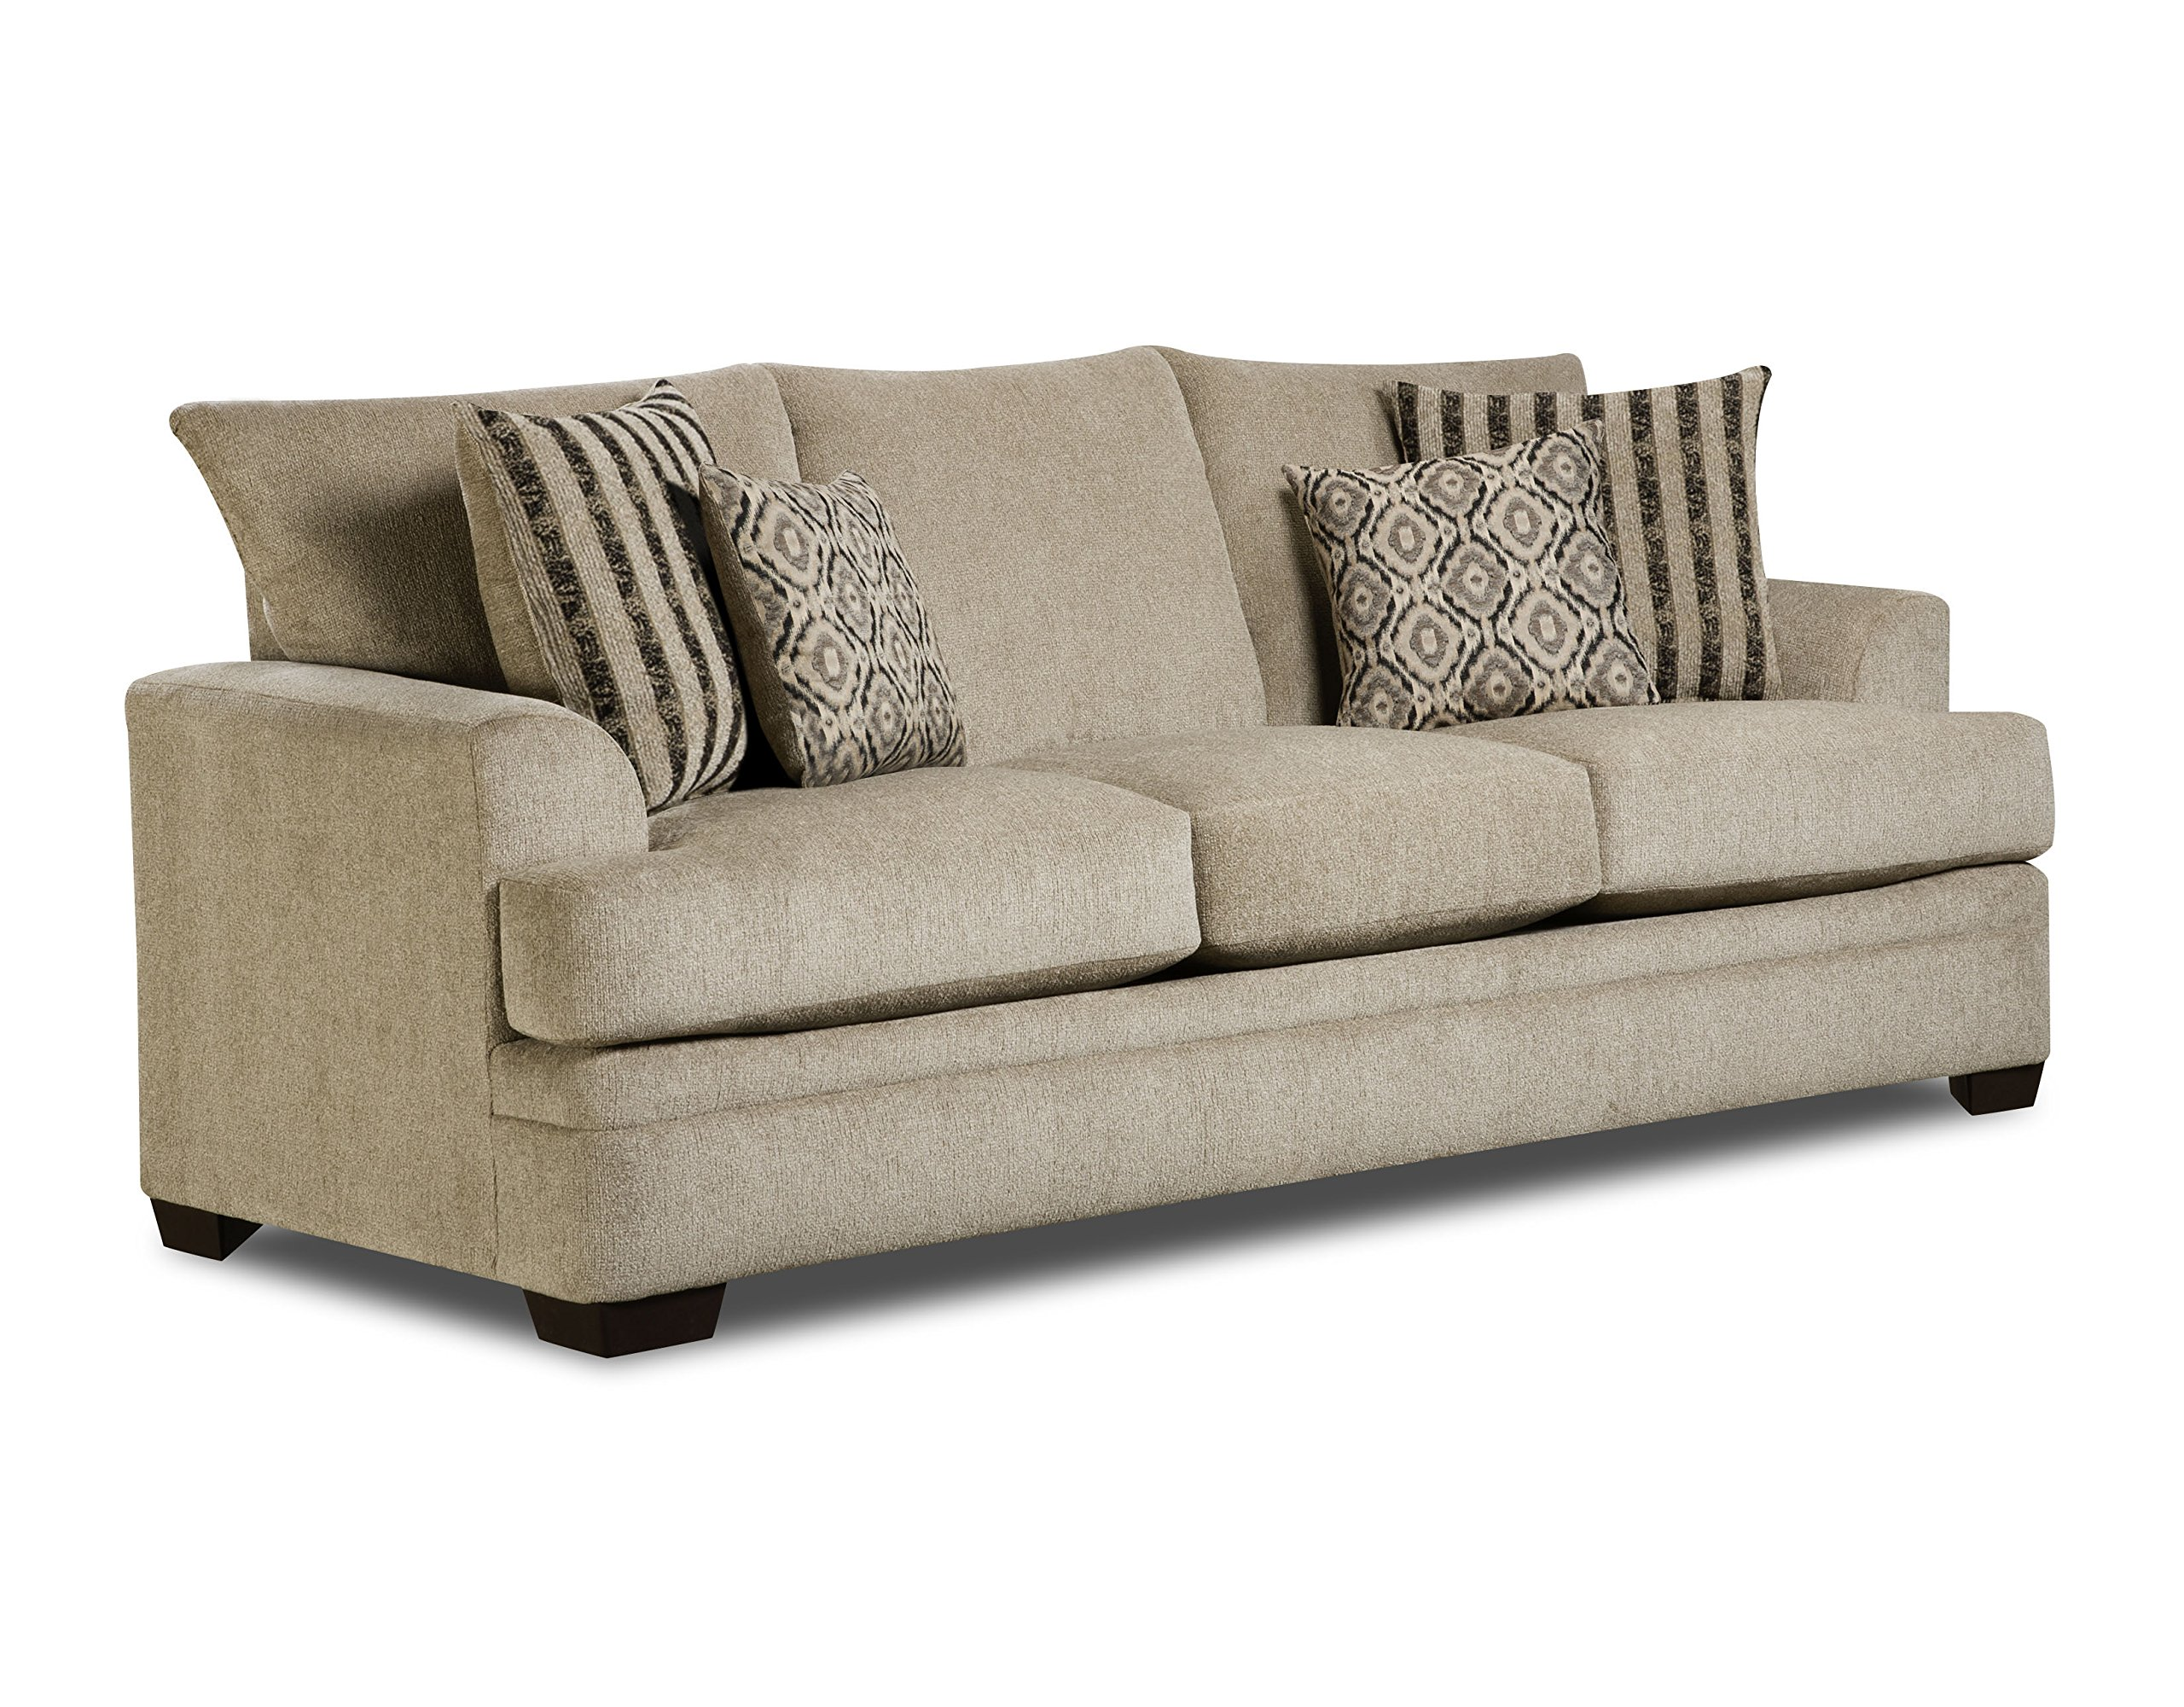 Pearington Savannah Polyester Living Room 3 Seat Sofa, Platinum